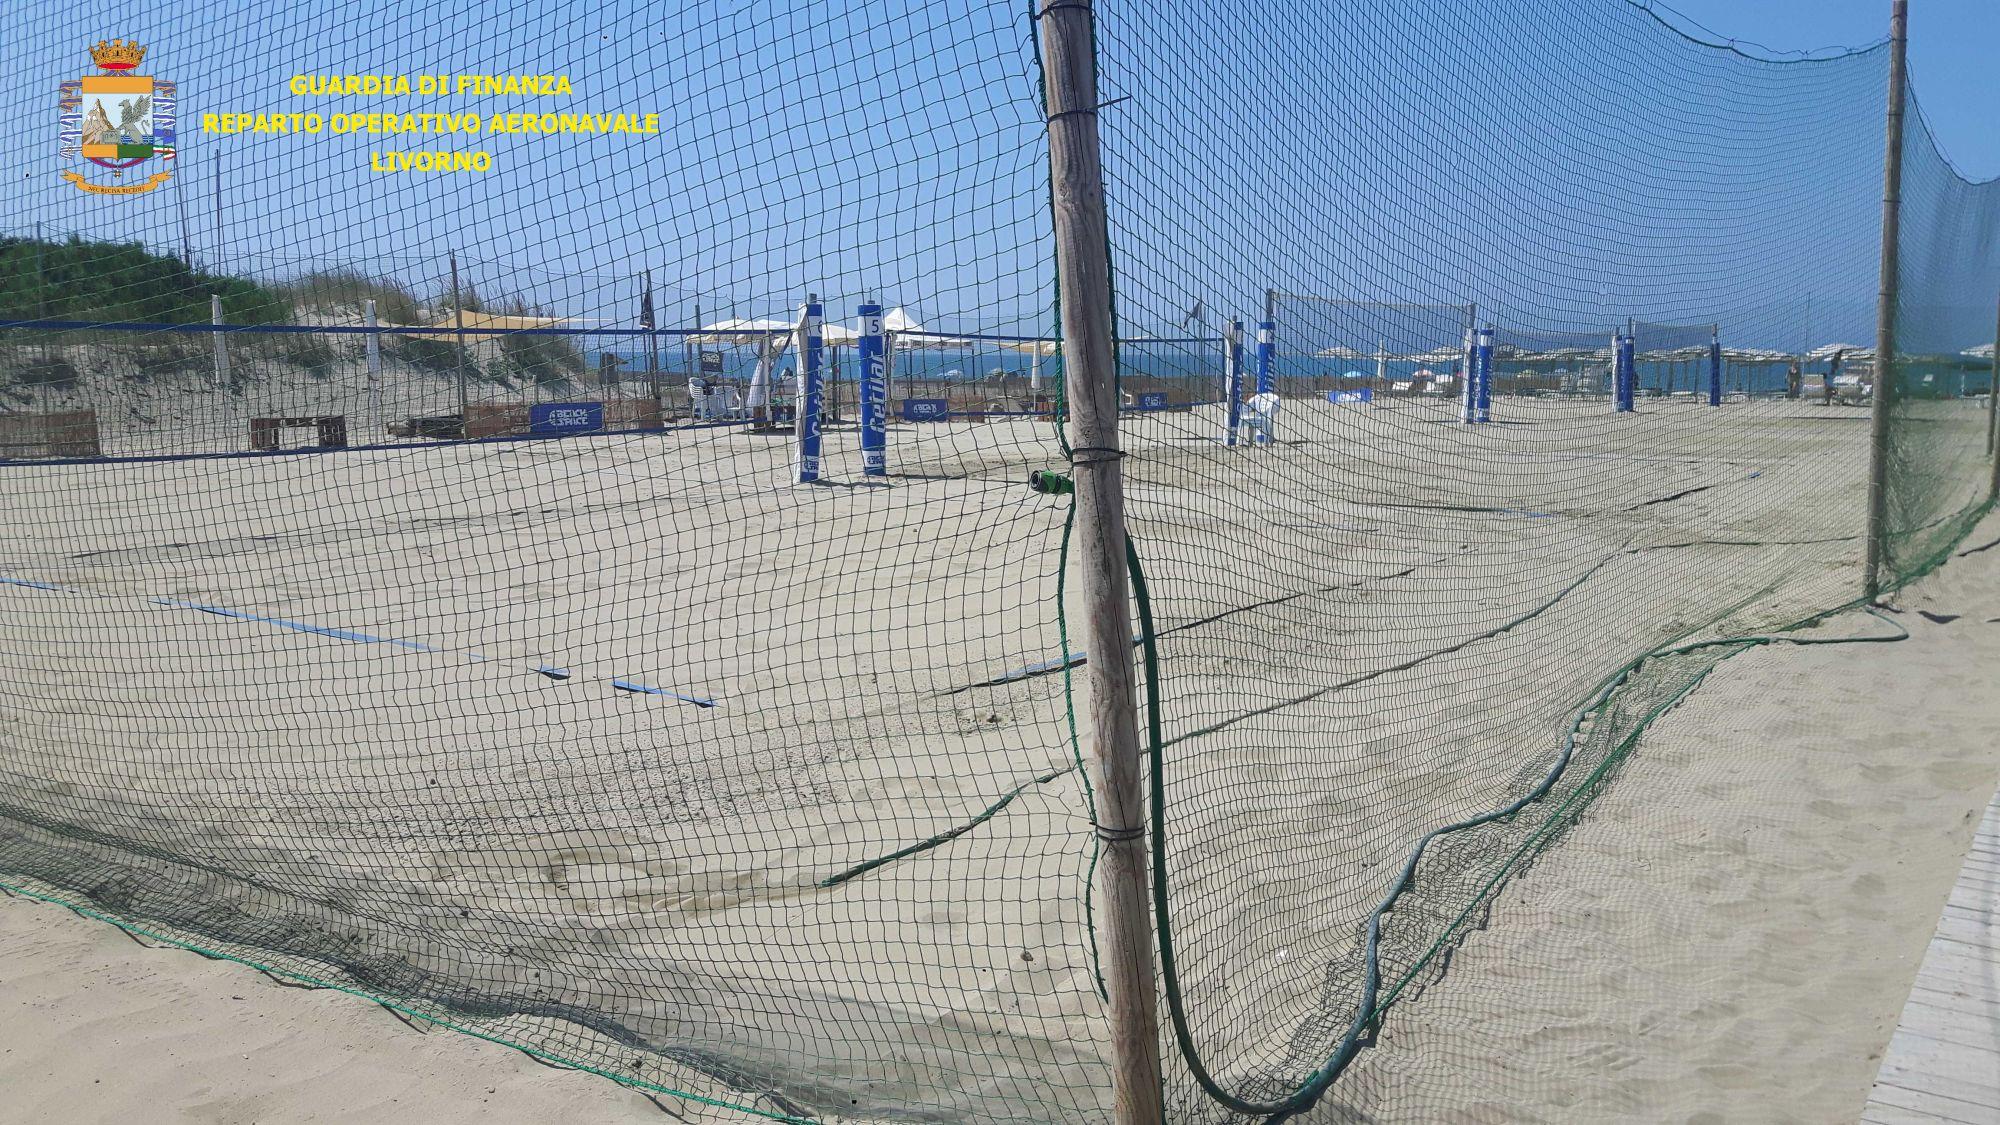 Un bar e 5 campi di beach volley e beach tennis irregolarmente gestiti